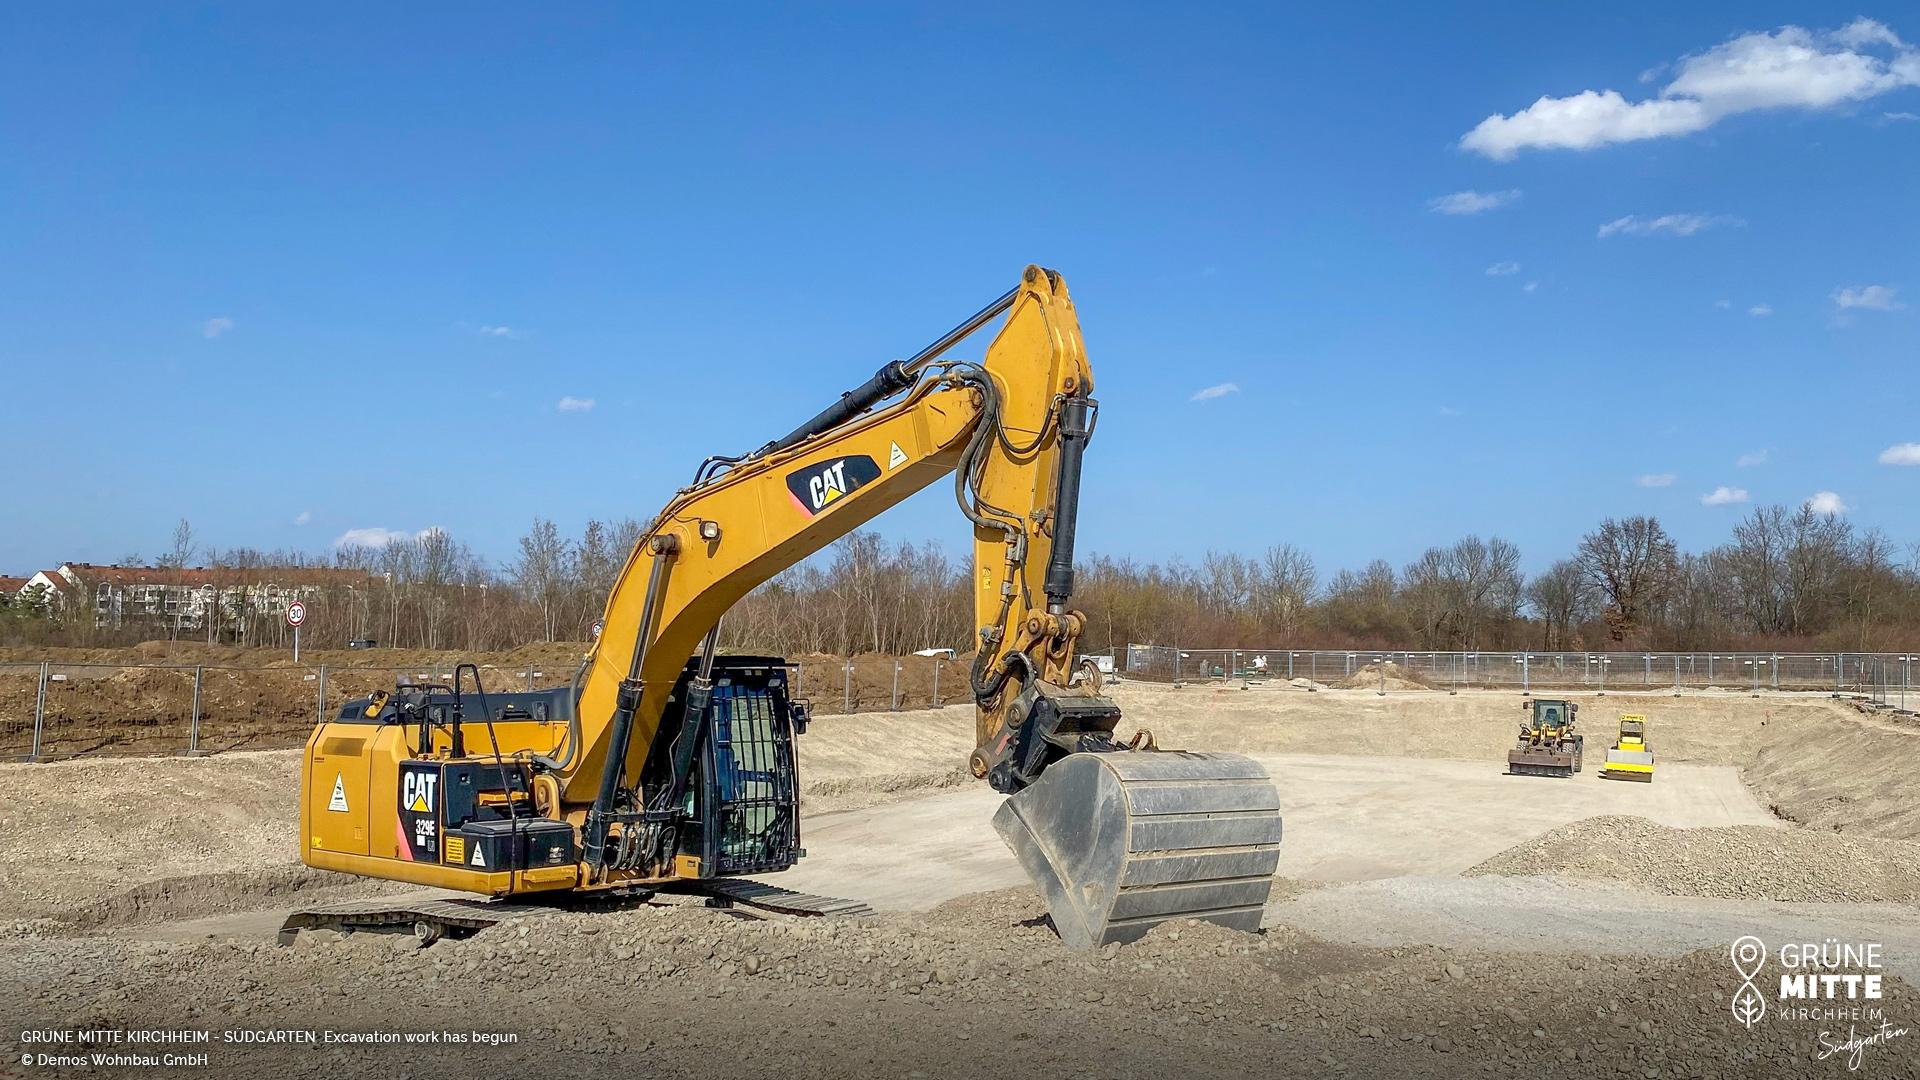 'GRÜNE MITTE KIRCHHEIM - Südgarten' in Kirchheim near Munich: Excavation work has begun